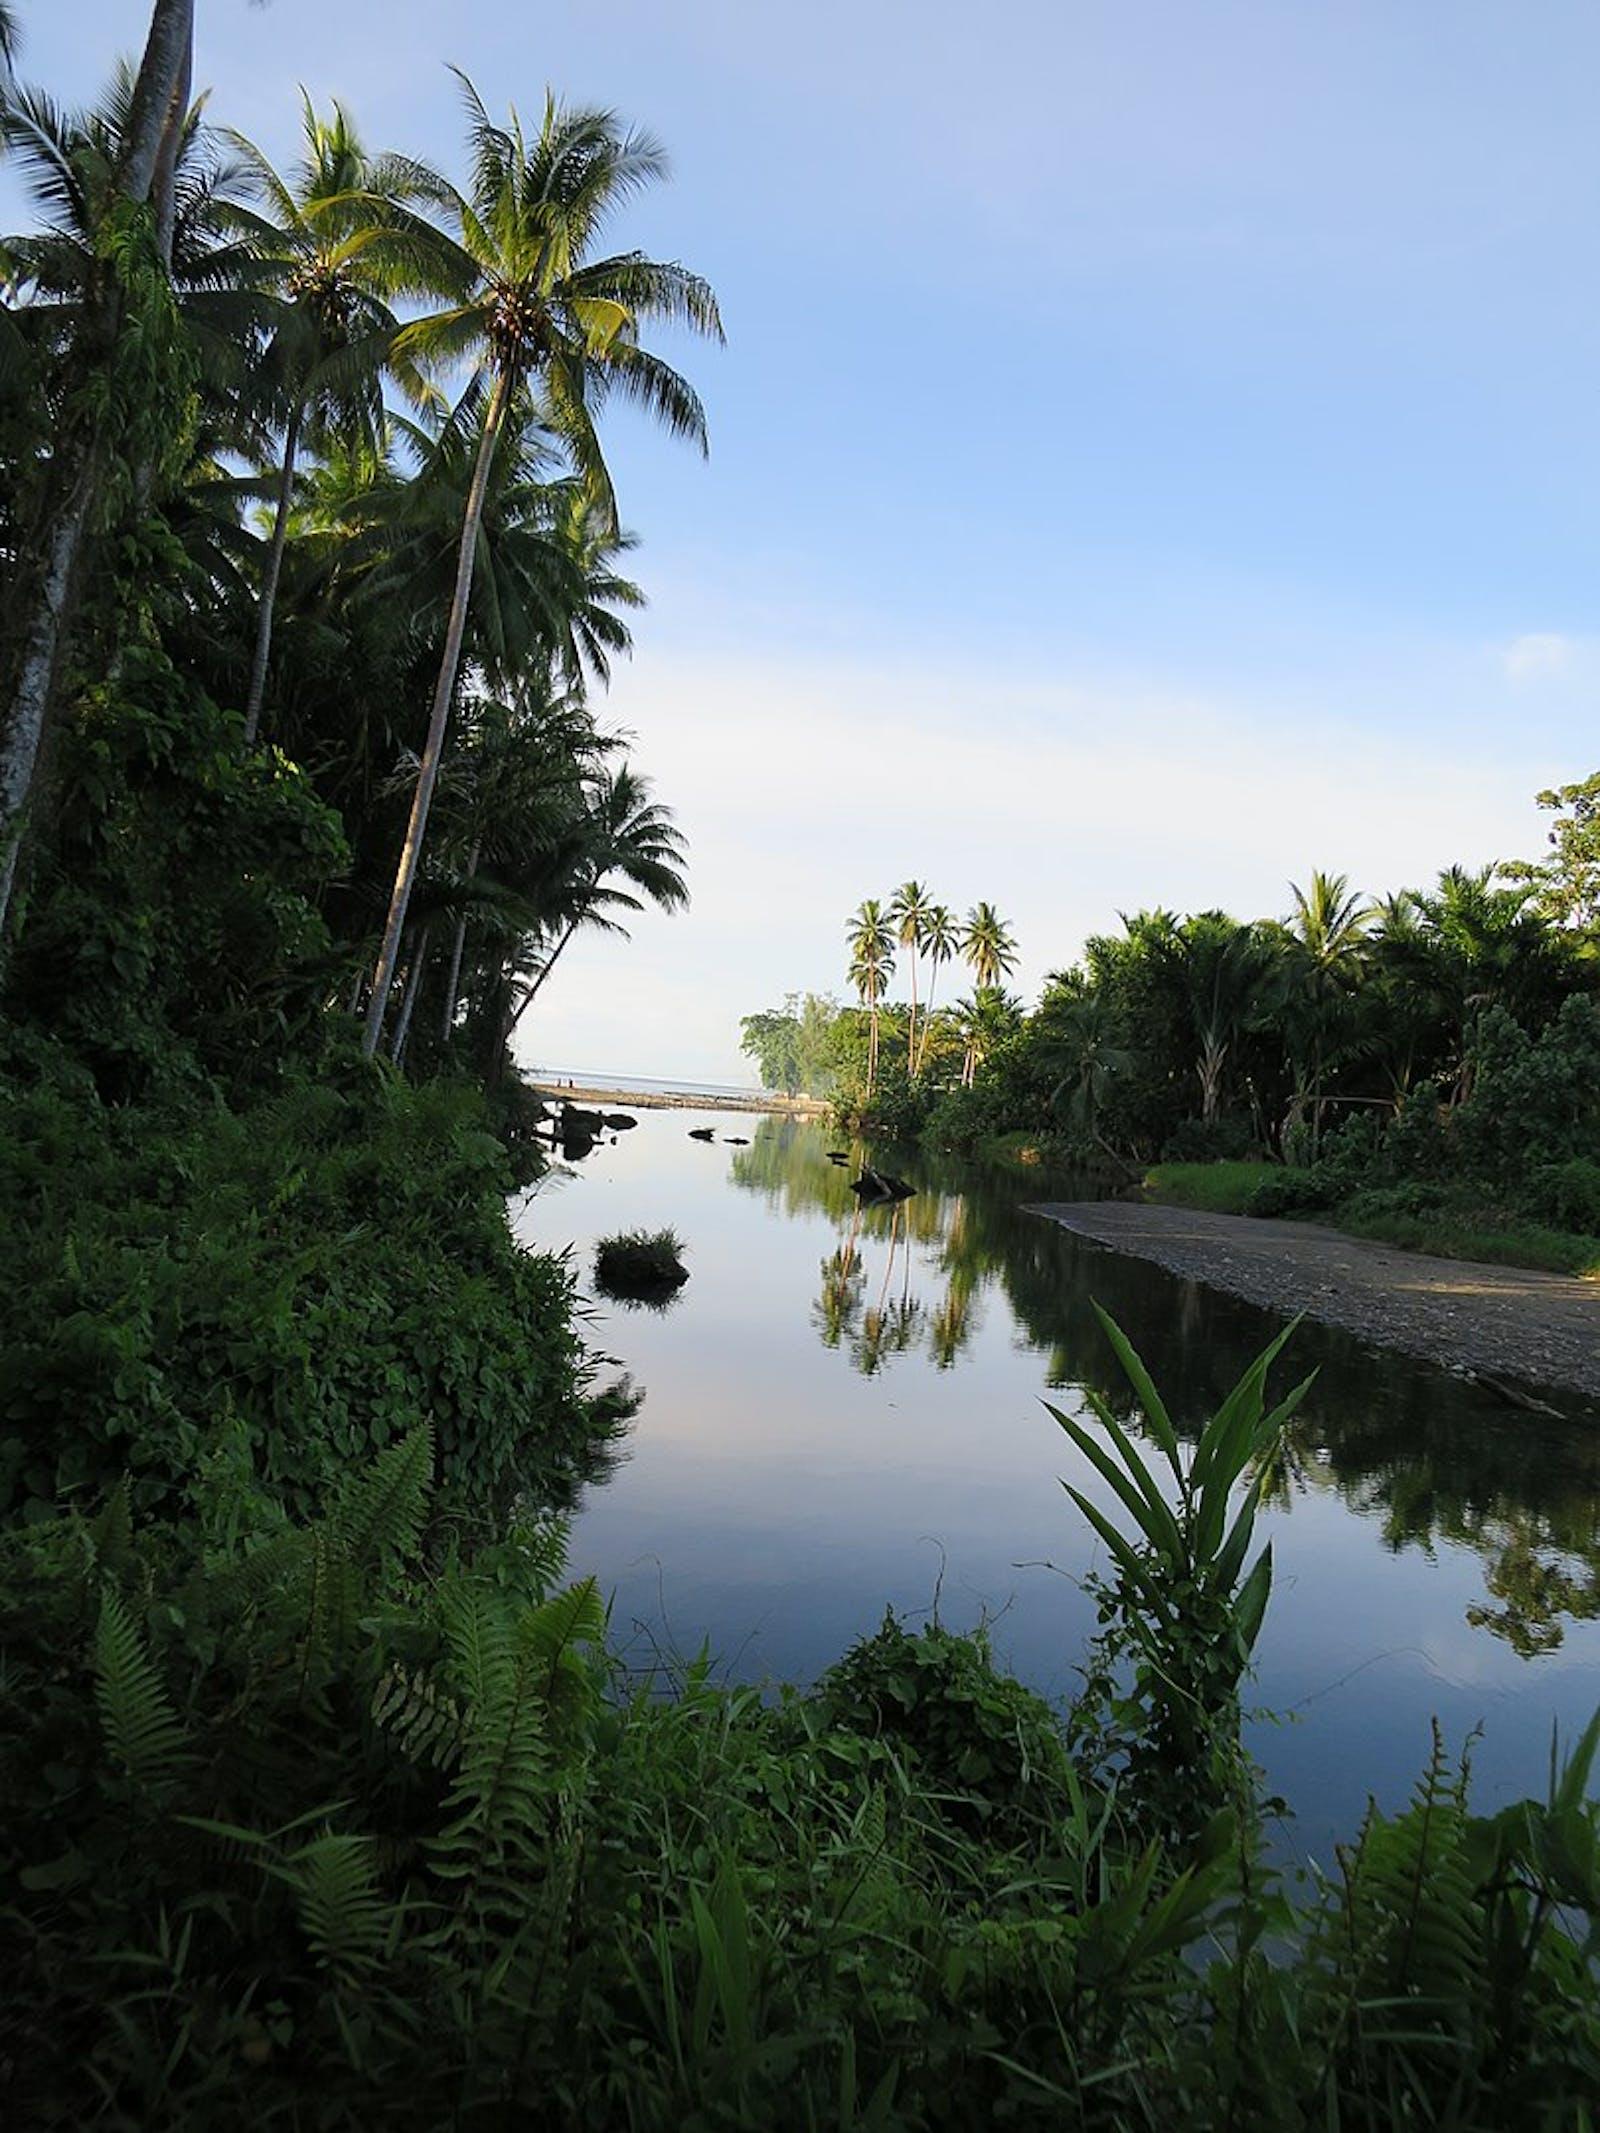 Solomon Islands Rainforests